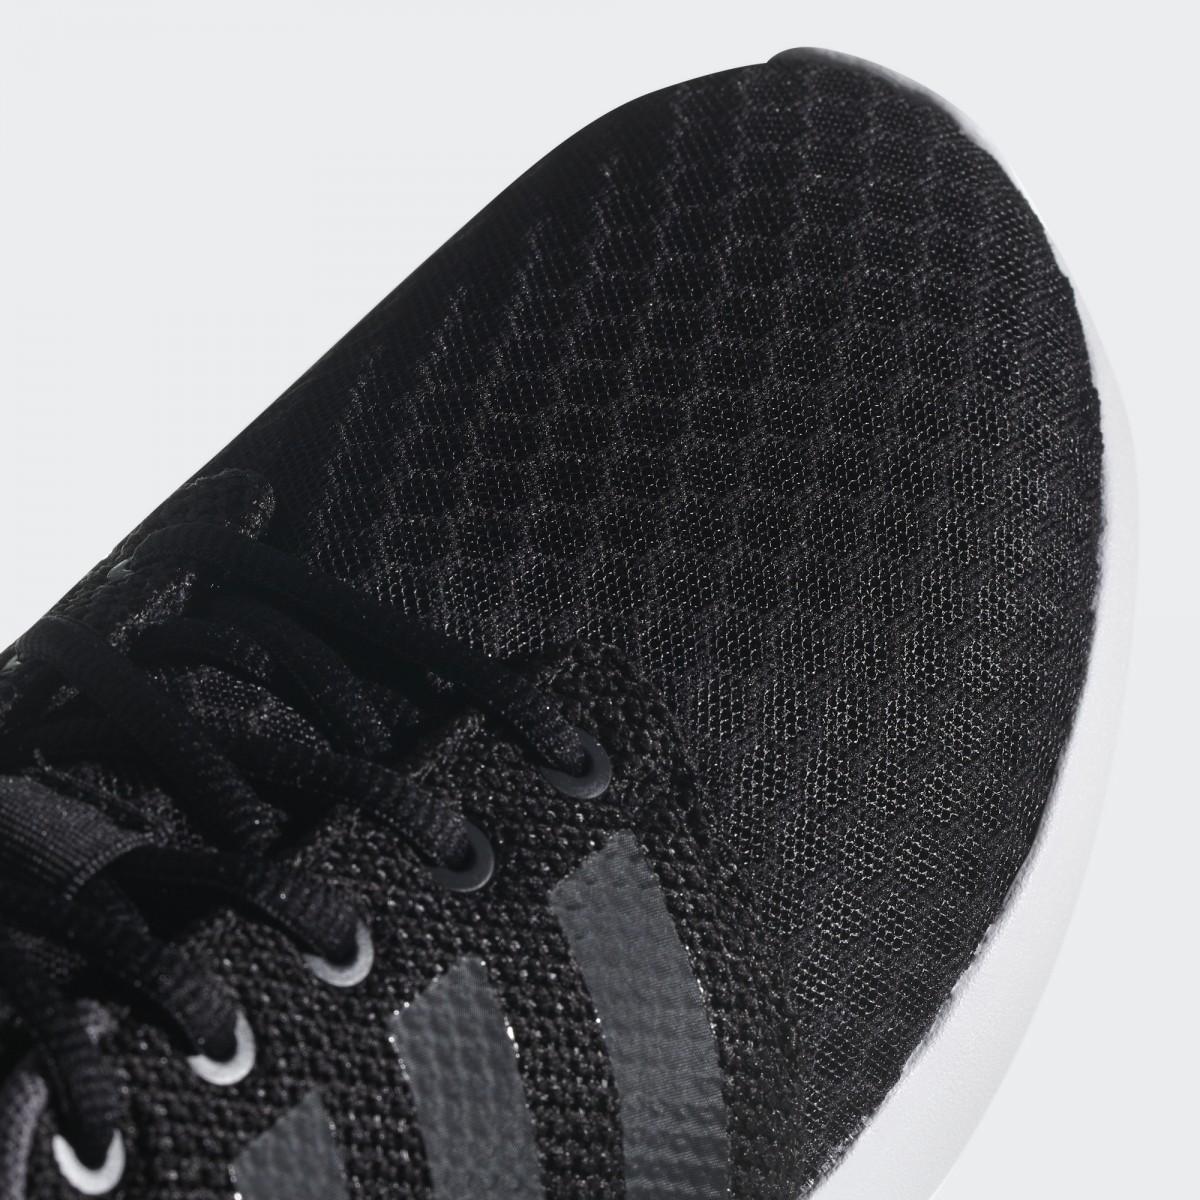 Lihat Adidas Sepatu Running Cloudfoam Swift Racer Db0679 Black Dan Lite Biru 4